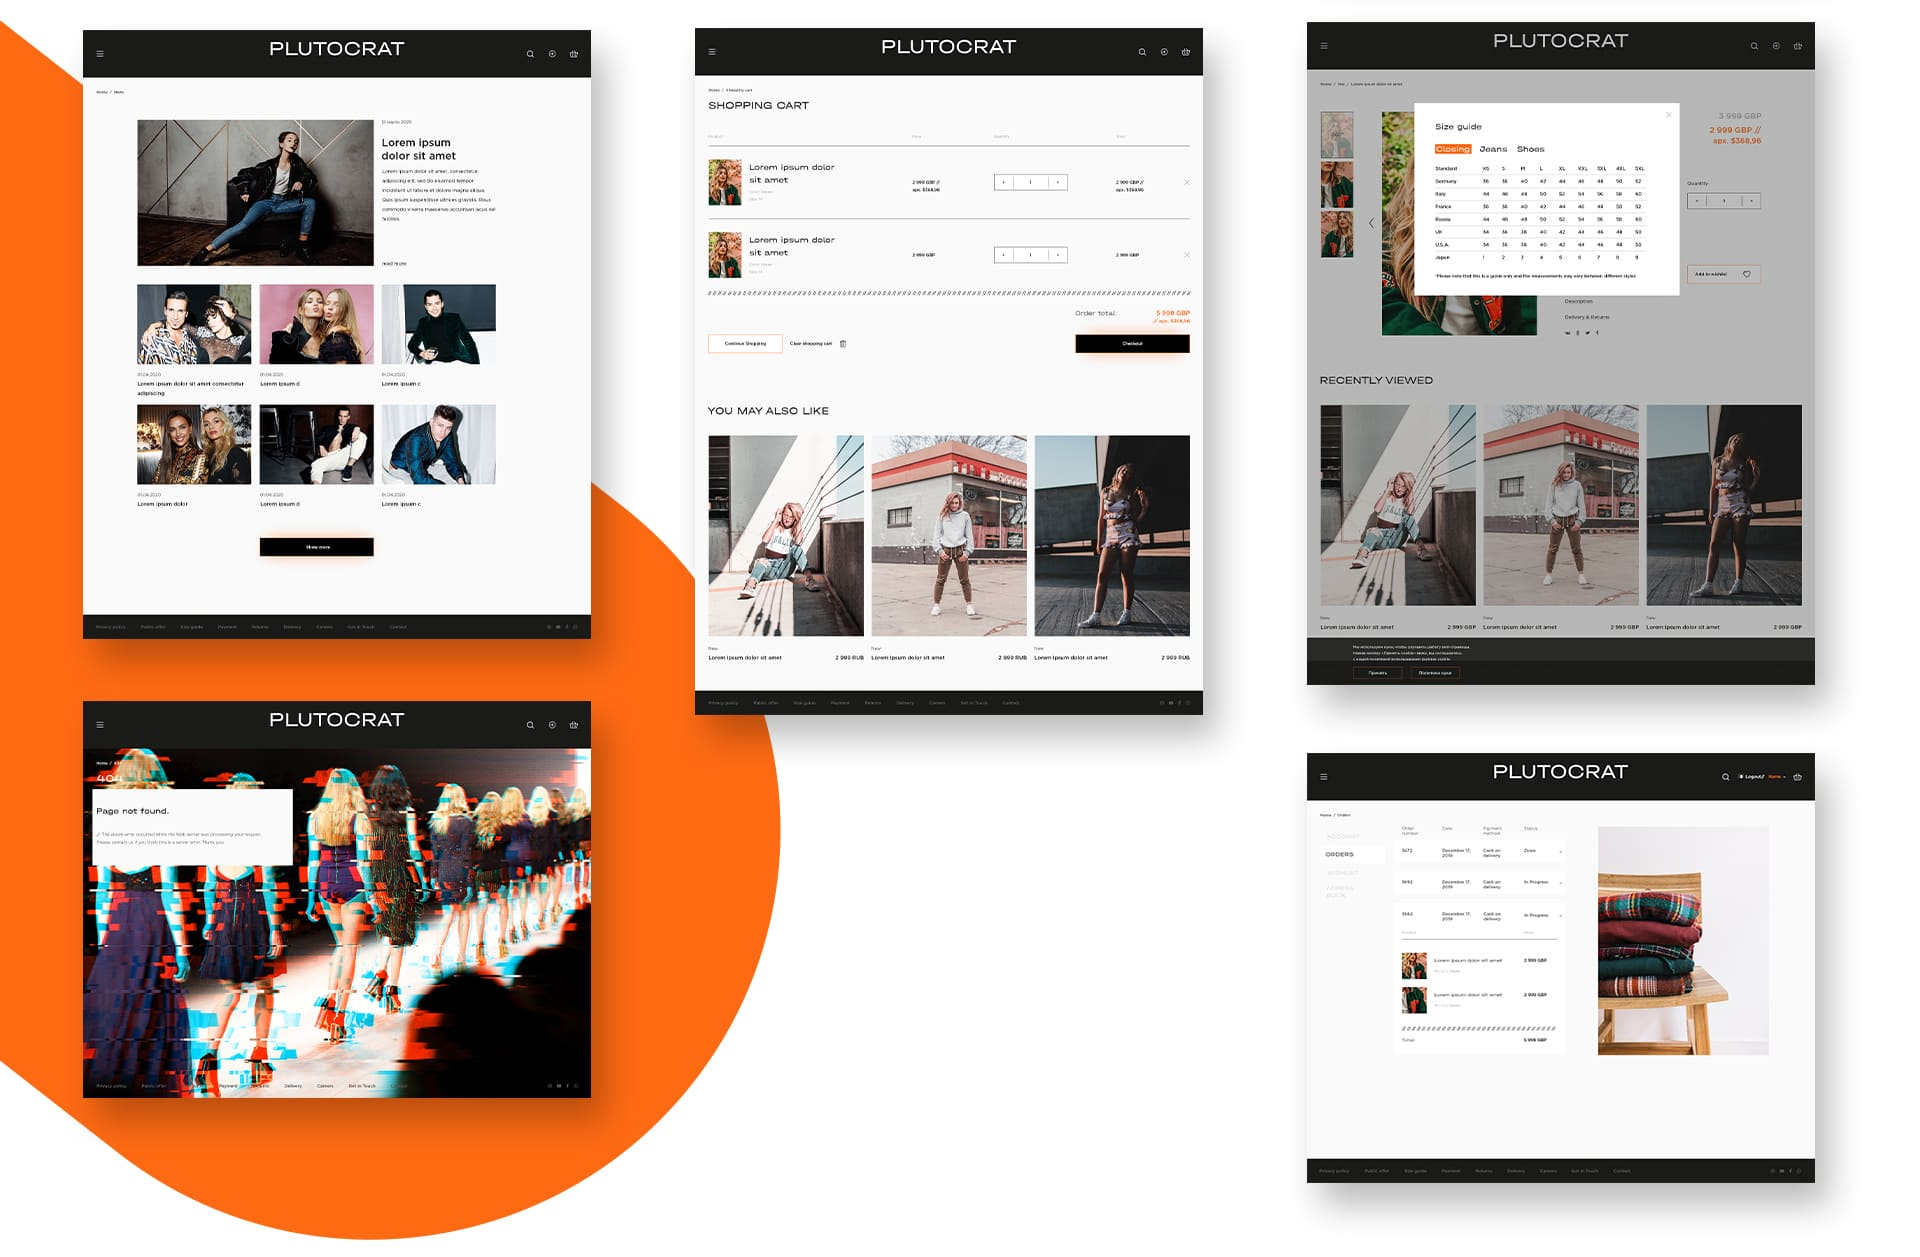 дизайн сайта интернет магазина презентация экранов